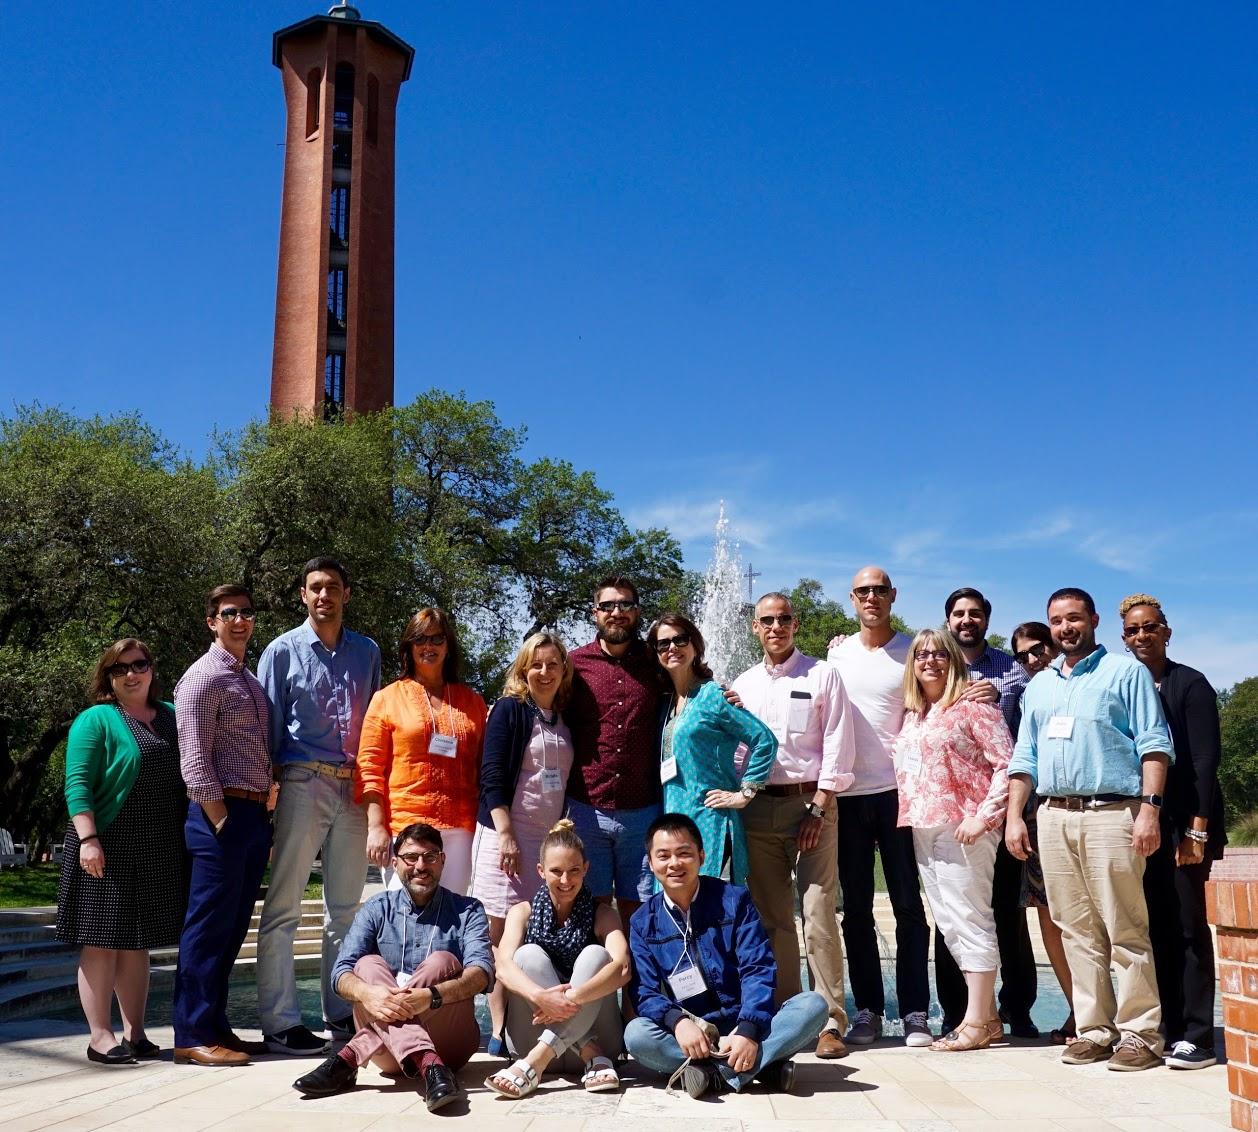 Trintiy University, San Antonio, Texas